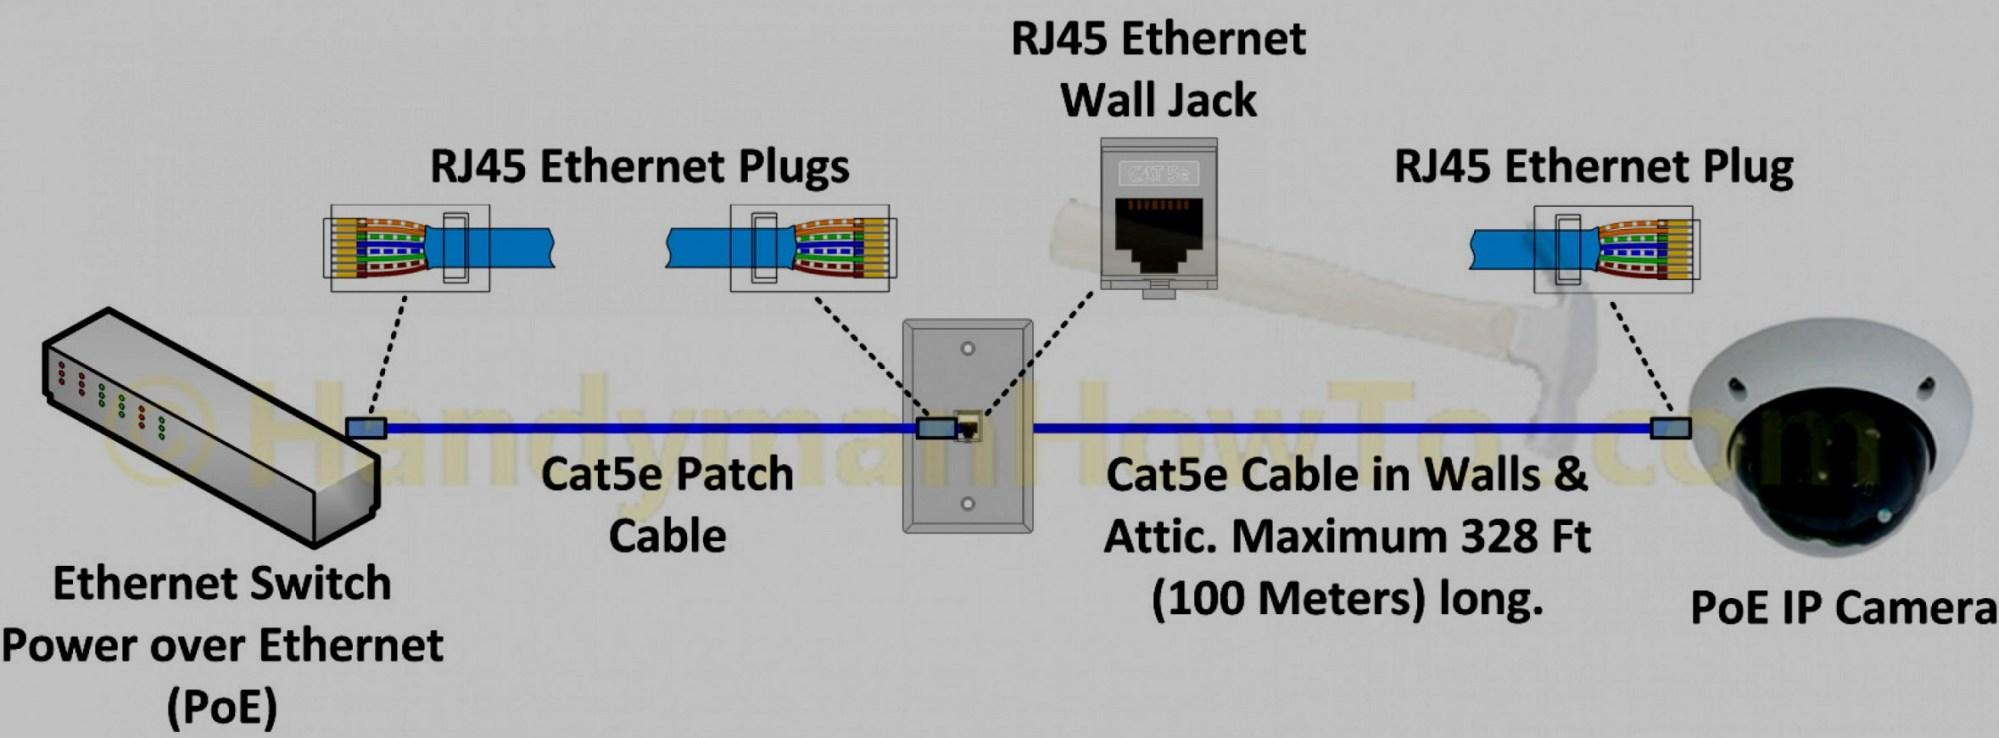 hight resolution of punch down block 110 wiring diagram free download wiring diagramethernet punch down diagram basic electronics wiring